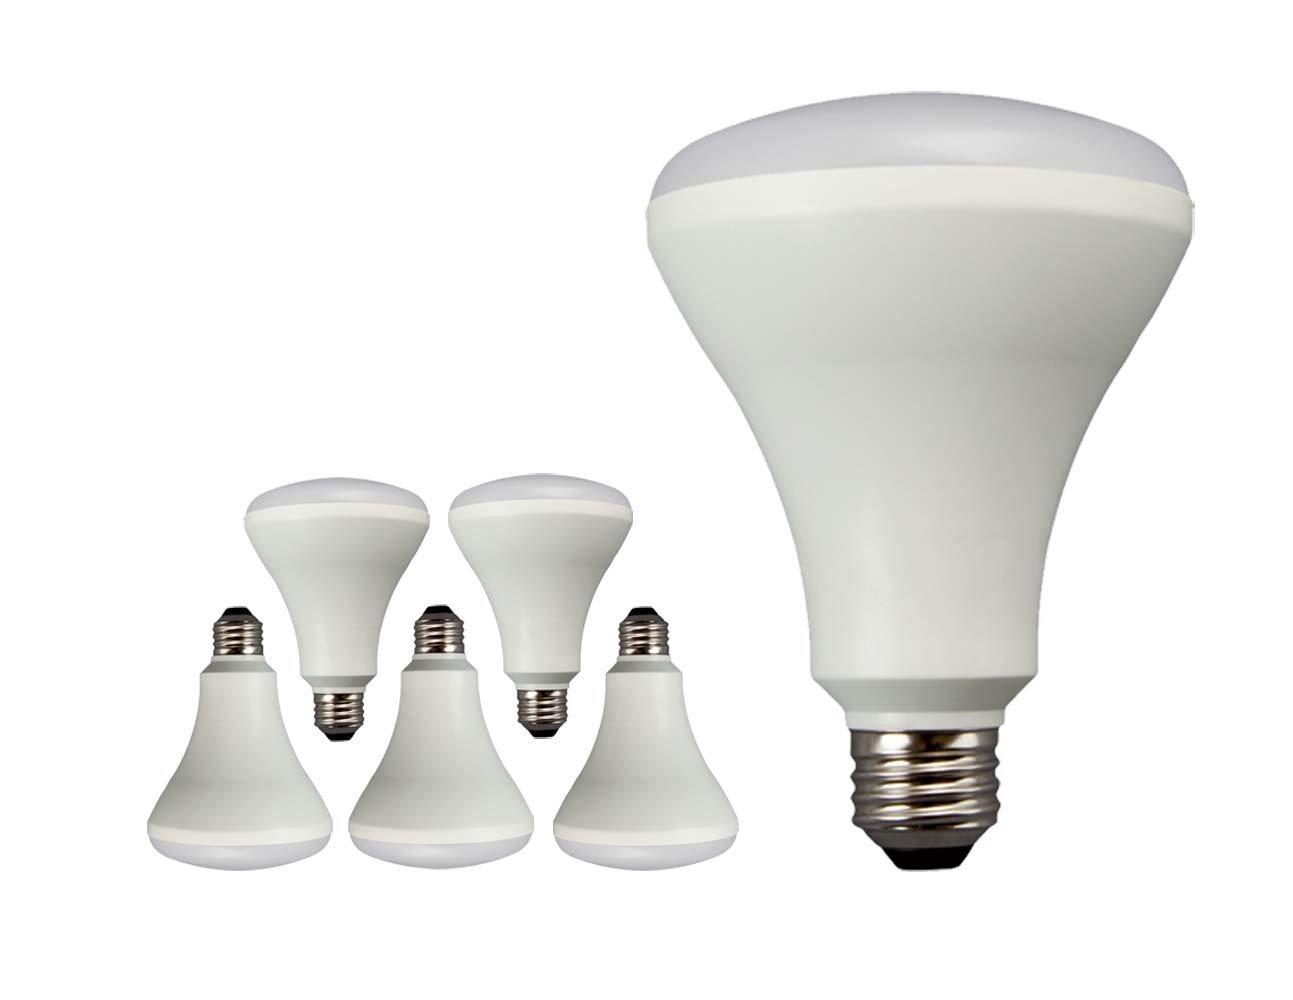 Cheap Tcp Lbr301050knd6 Led Br30 65 Watt Equivalent Daylight 5000k Flood Light Bulb 6 Pack